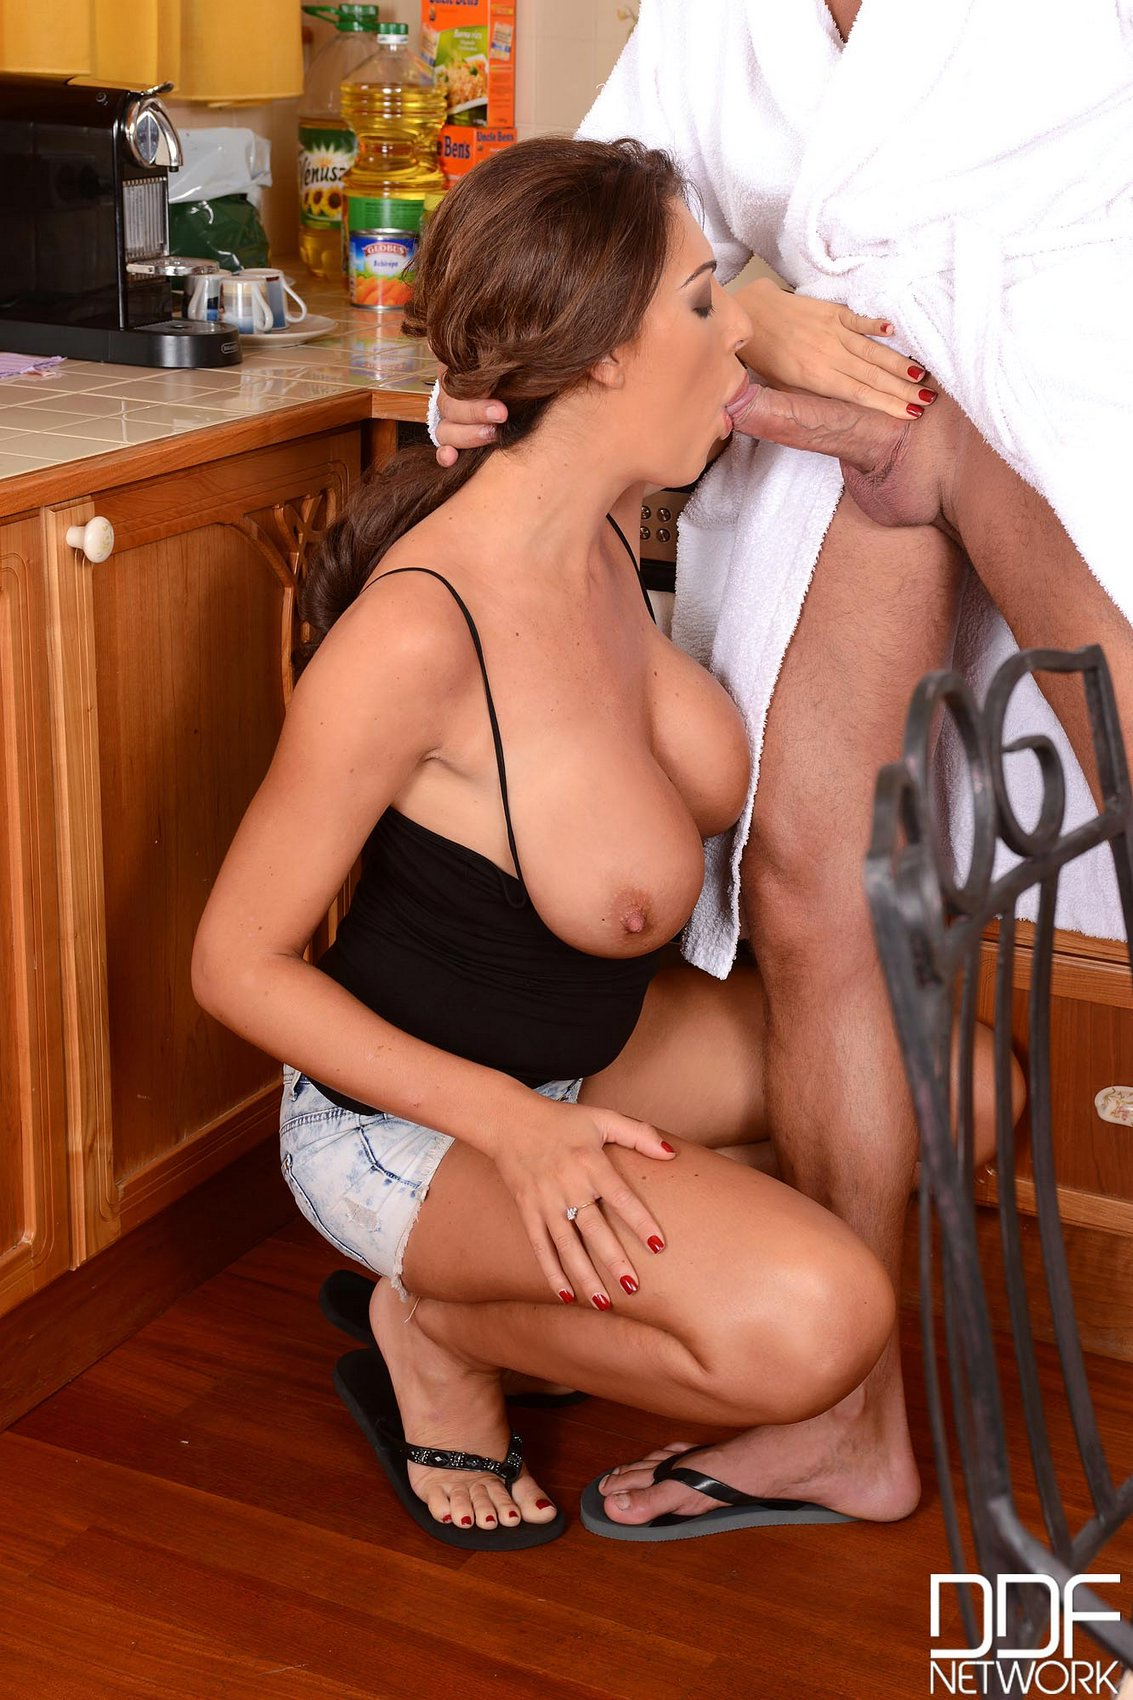 Bondage porn for busty slave performing oral sex under sub 8